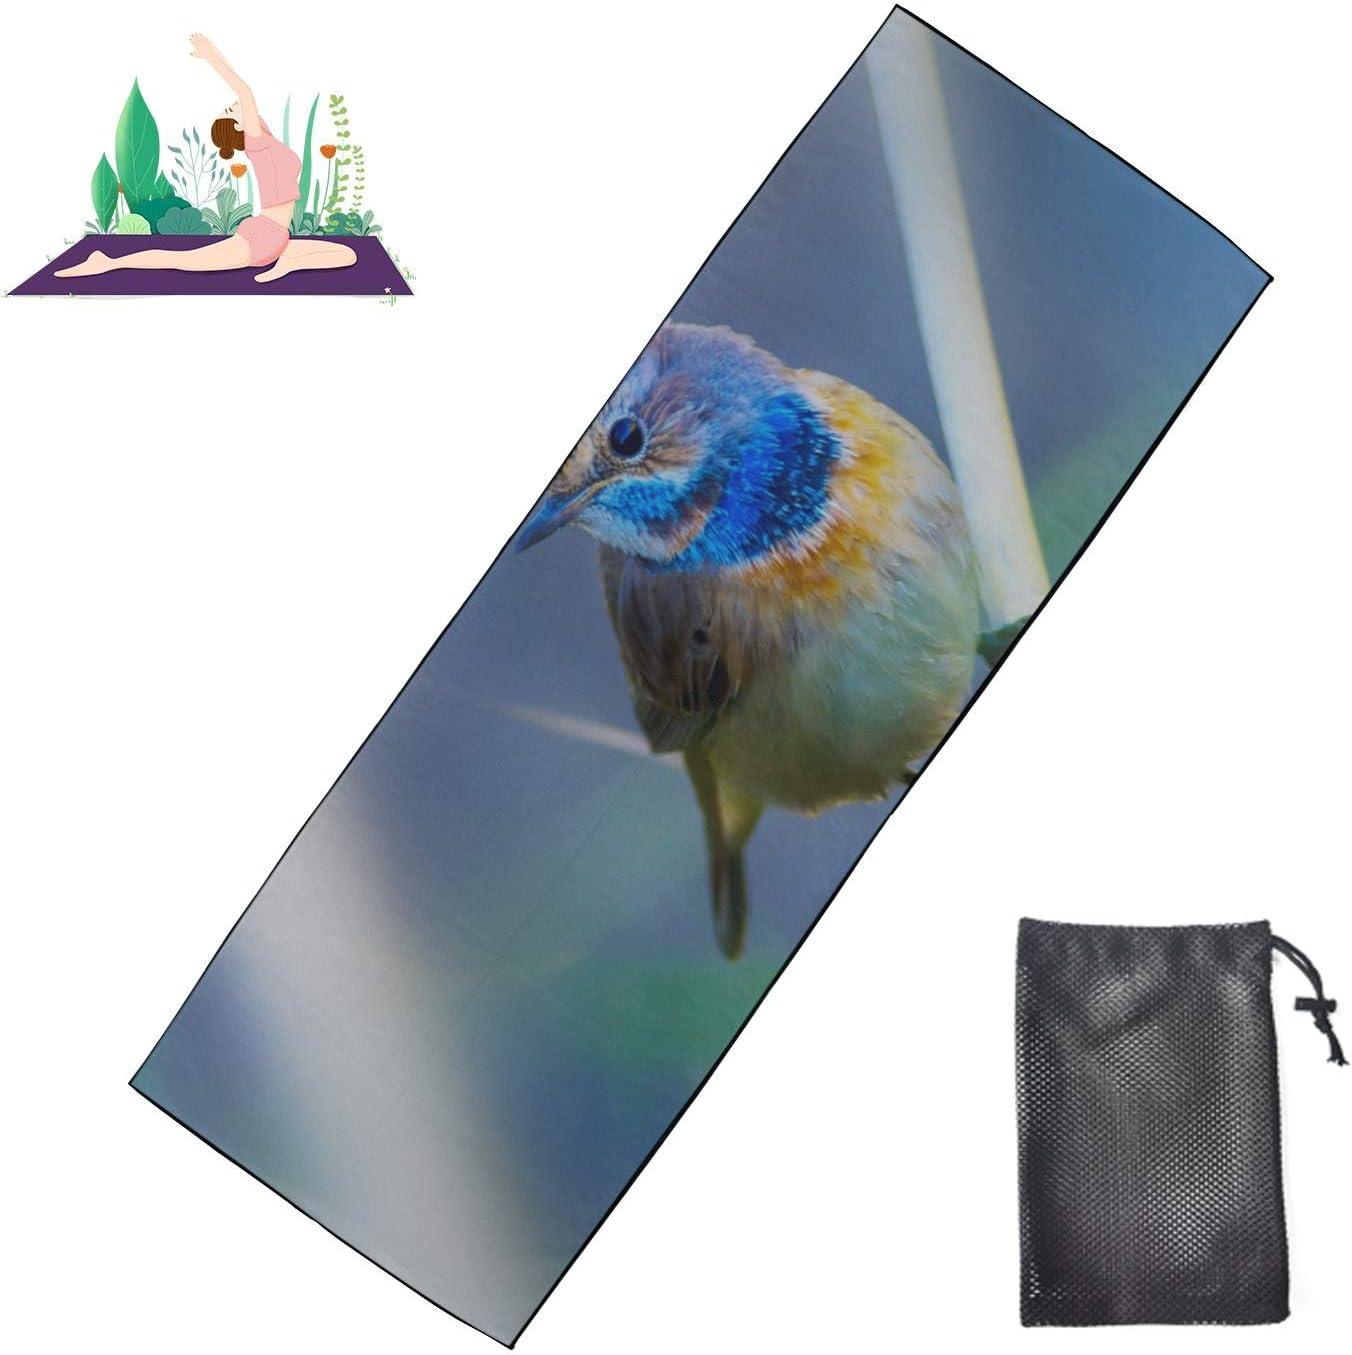 quality assurance Zaqiwa Hot Yoga Attention brand Towel Men Brightly Mat Birds M Gym Coloured